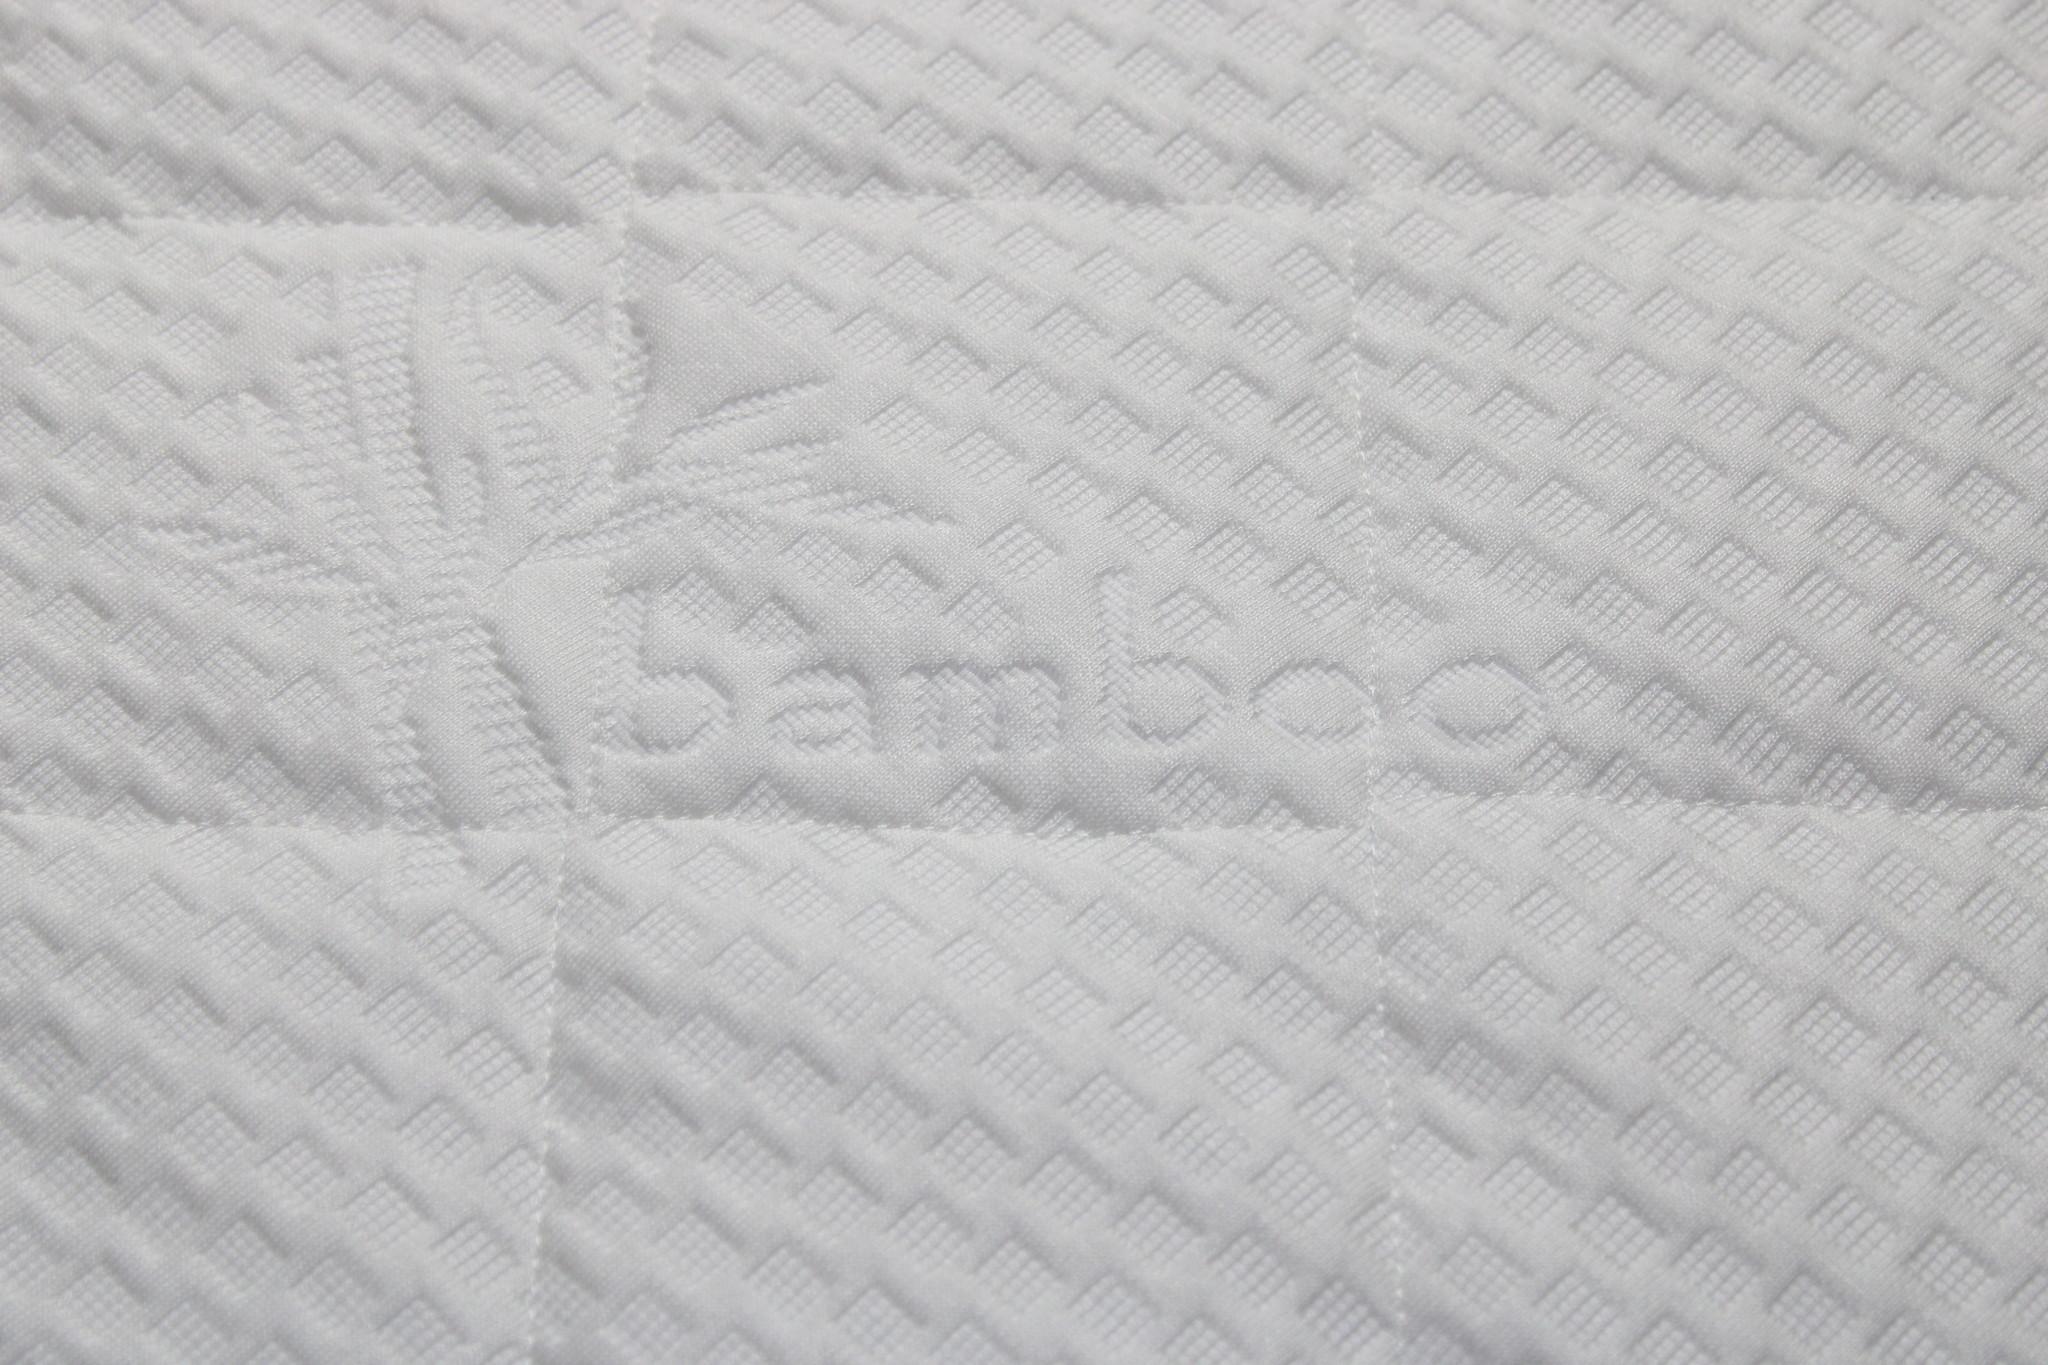 Sarpy Kindermatras 90x170  koudschuim hr40 bamboo